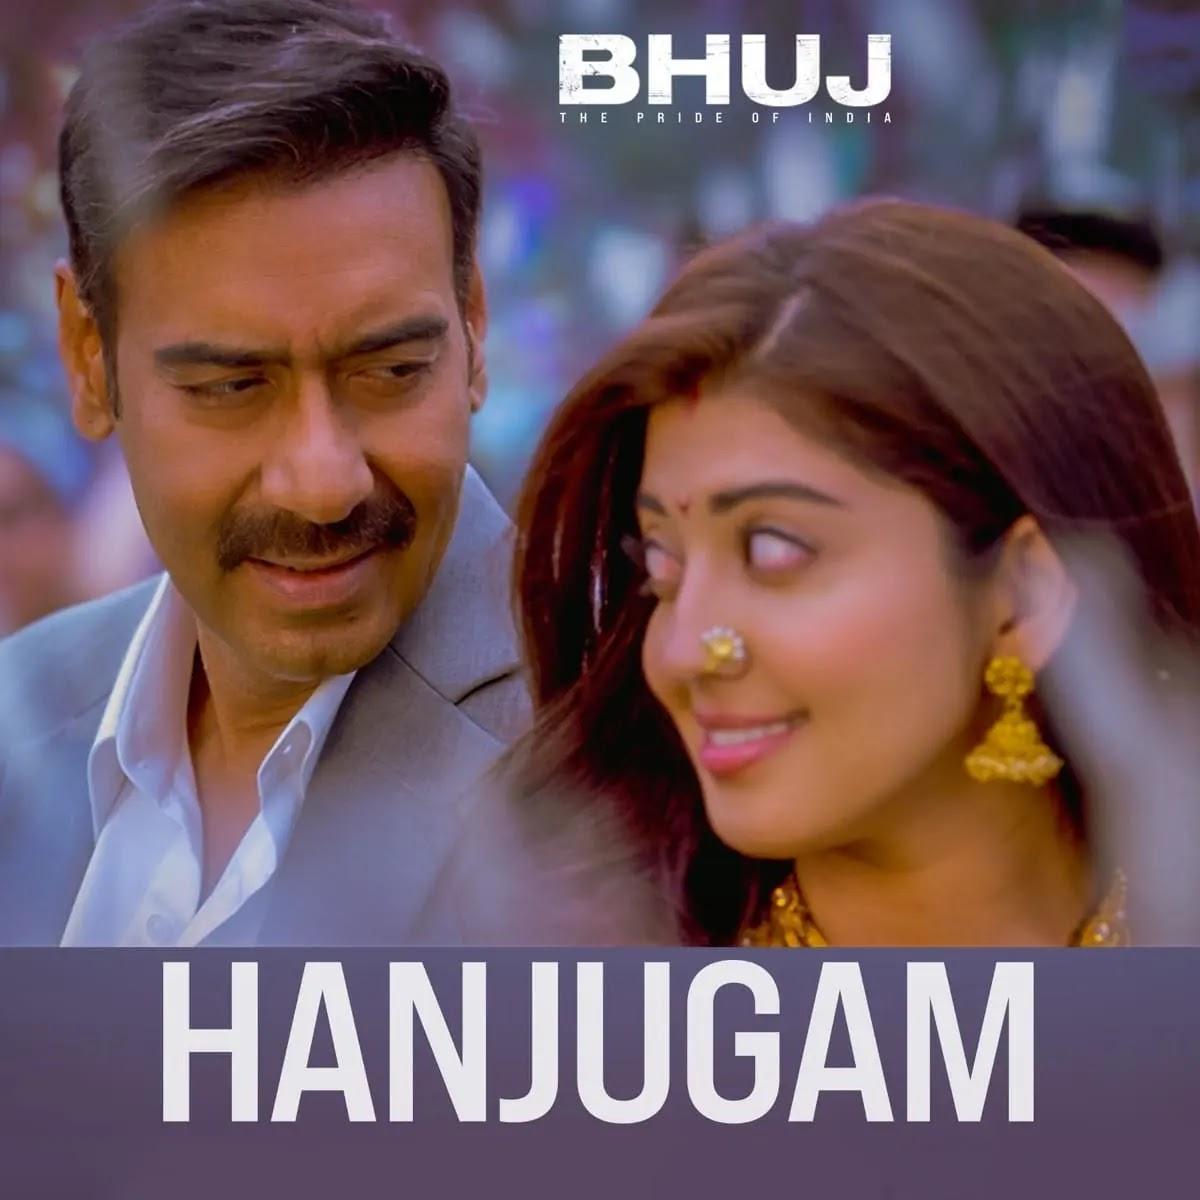 Hanjugam Bhuj Mp3 Song Download 320kbps Free